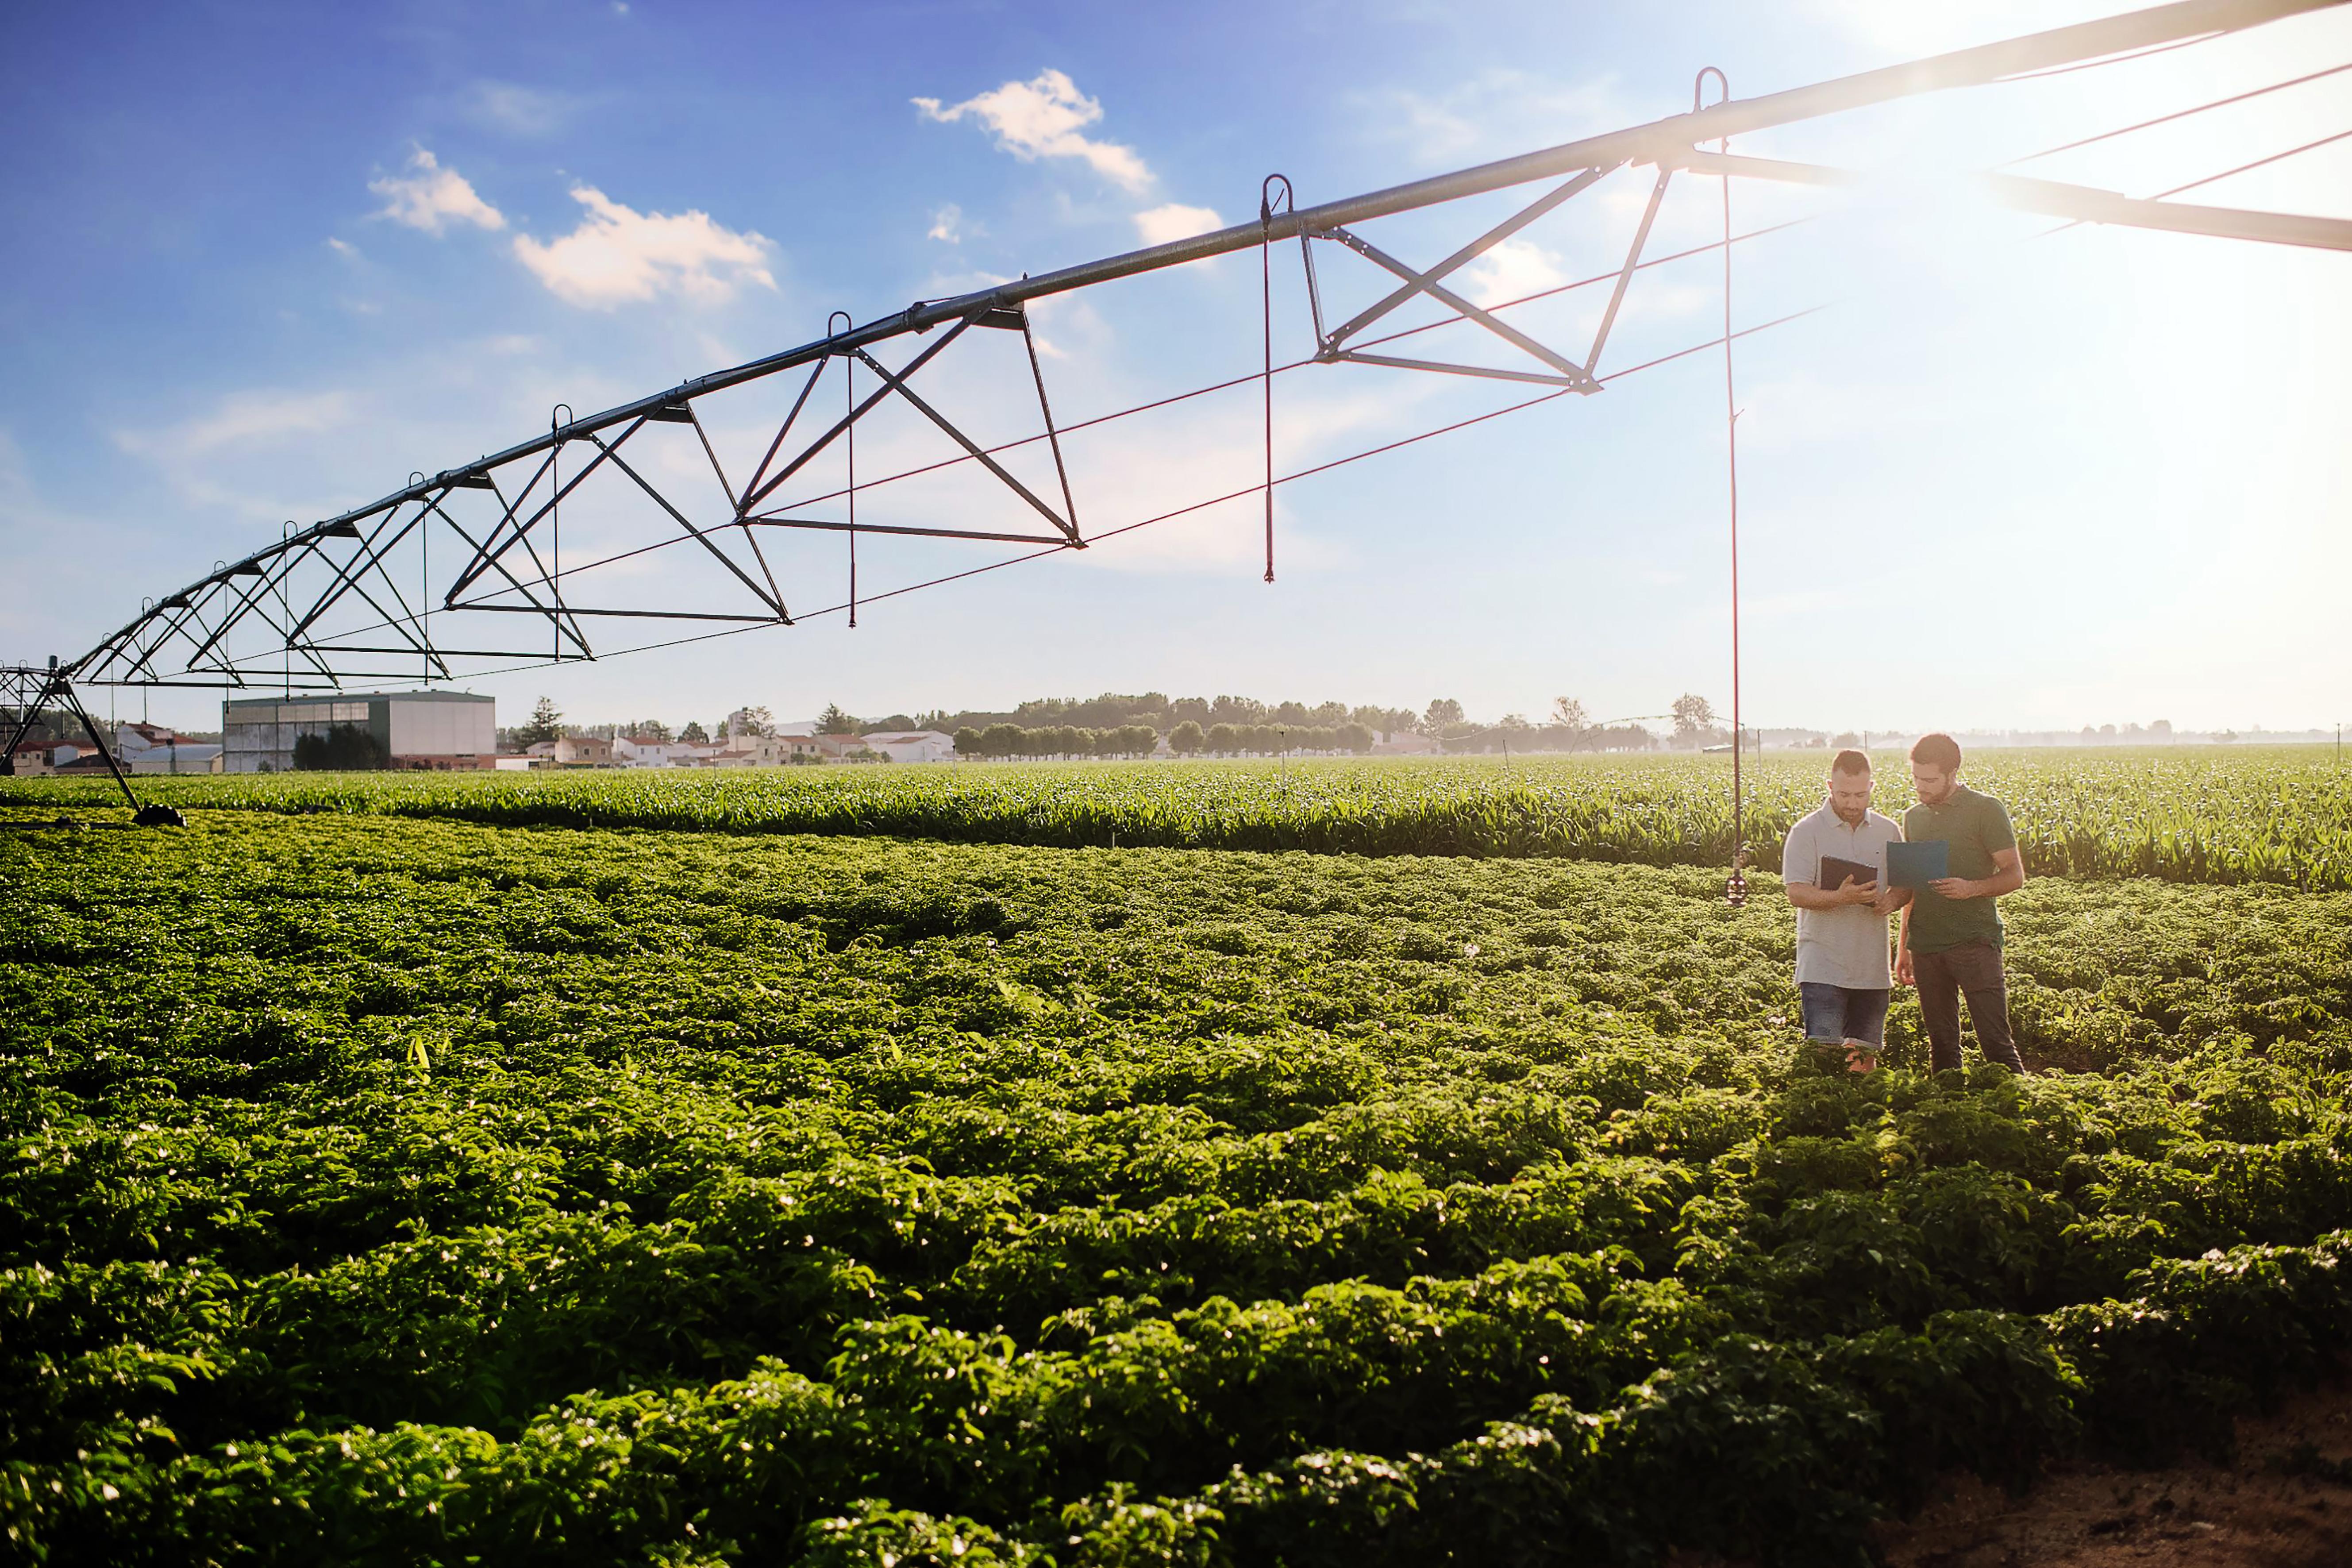 farmers using technology